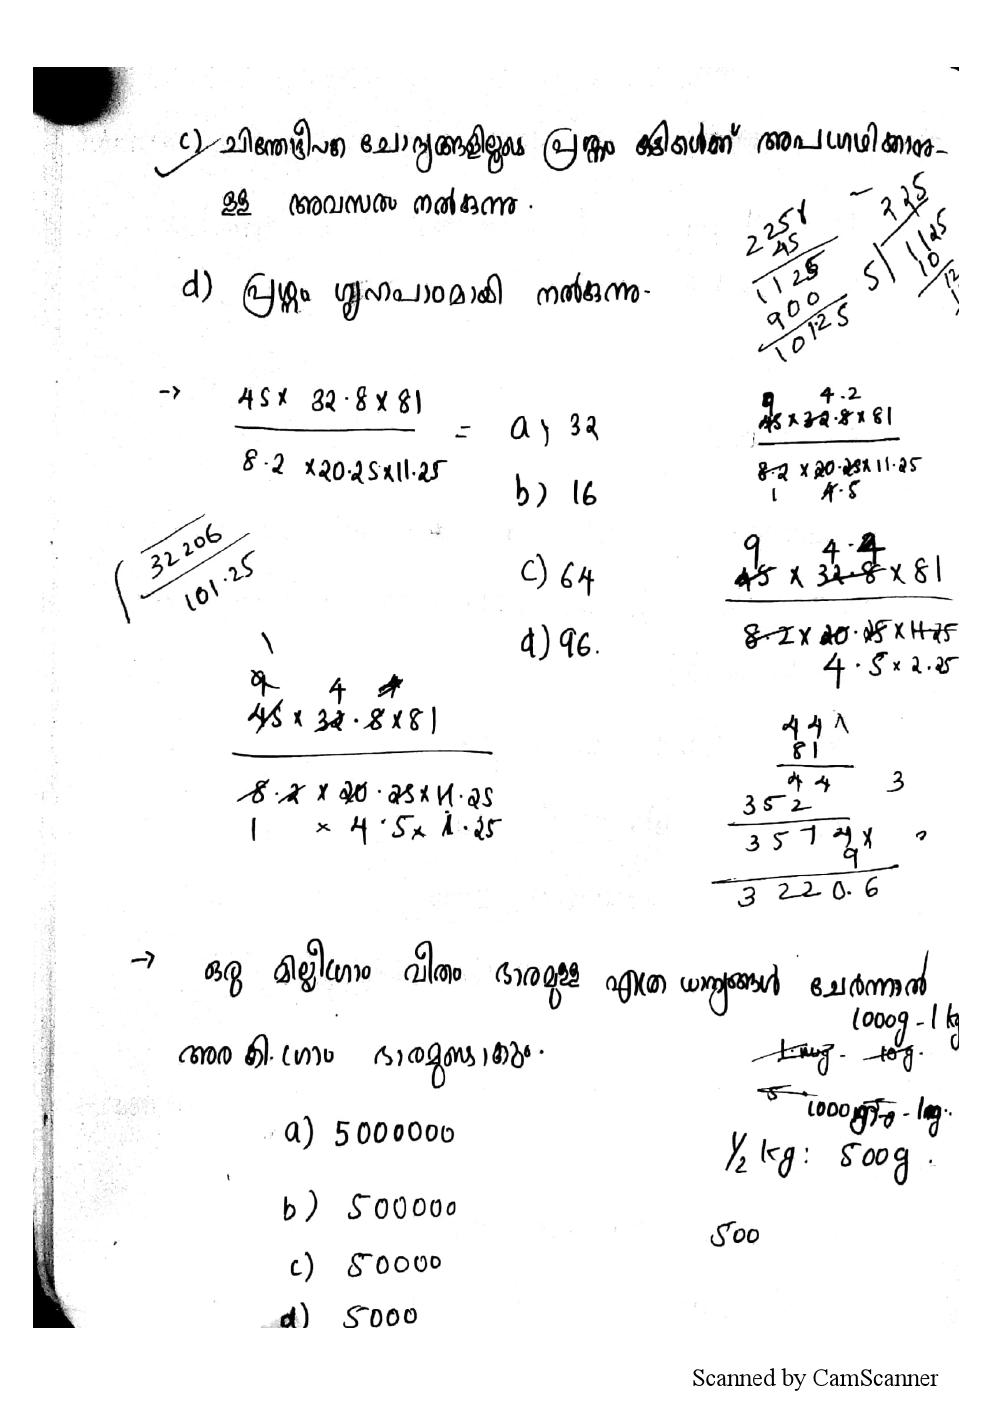 http://masterstudy.net/pdf/ktet_notes0029.png